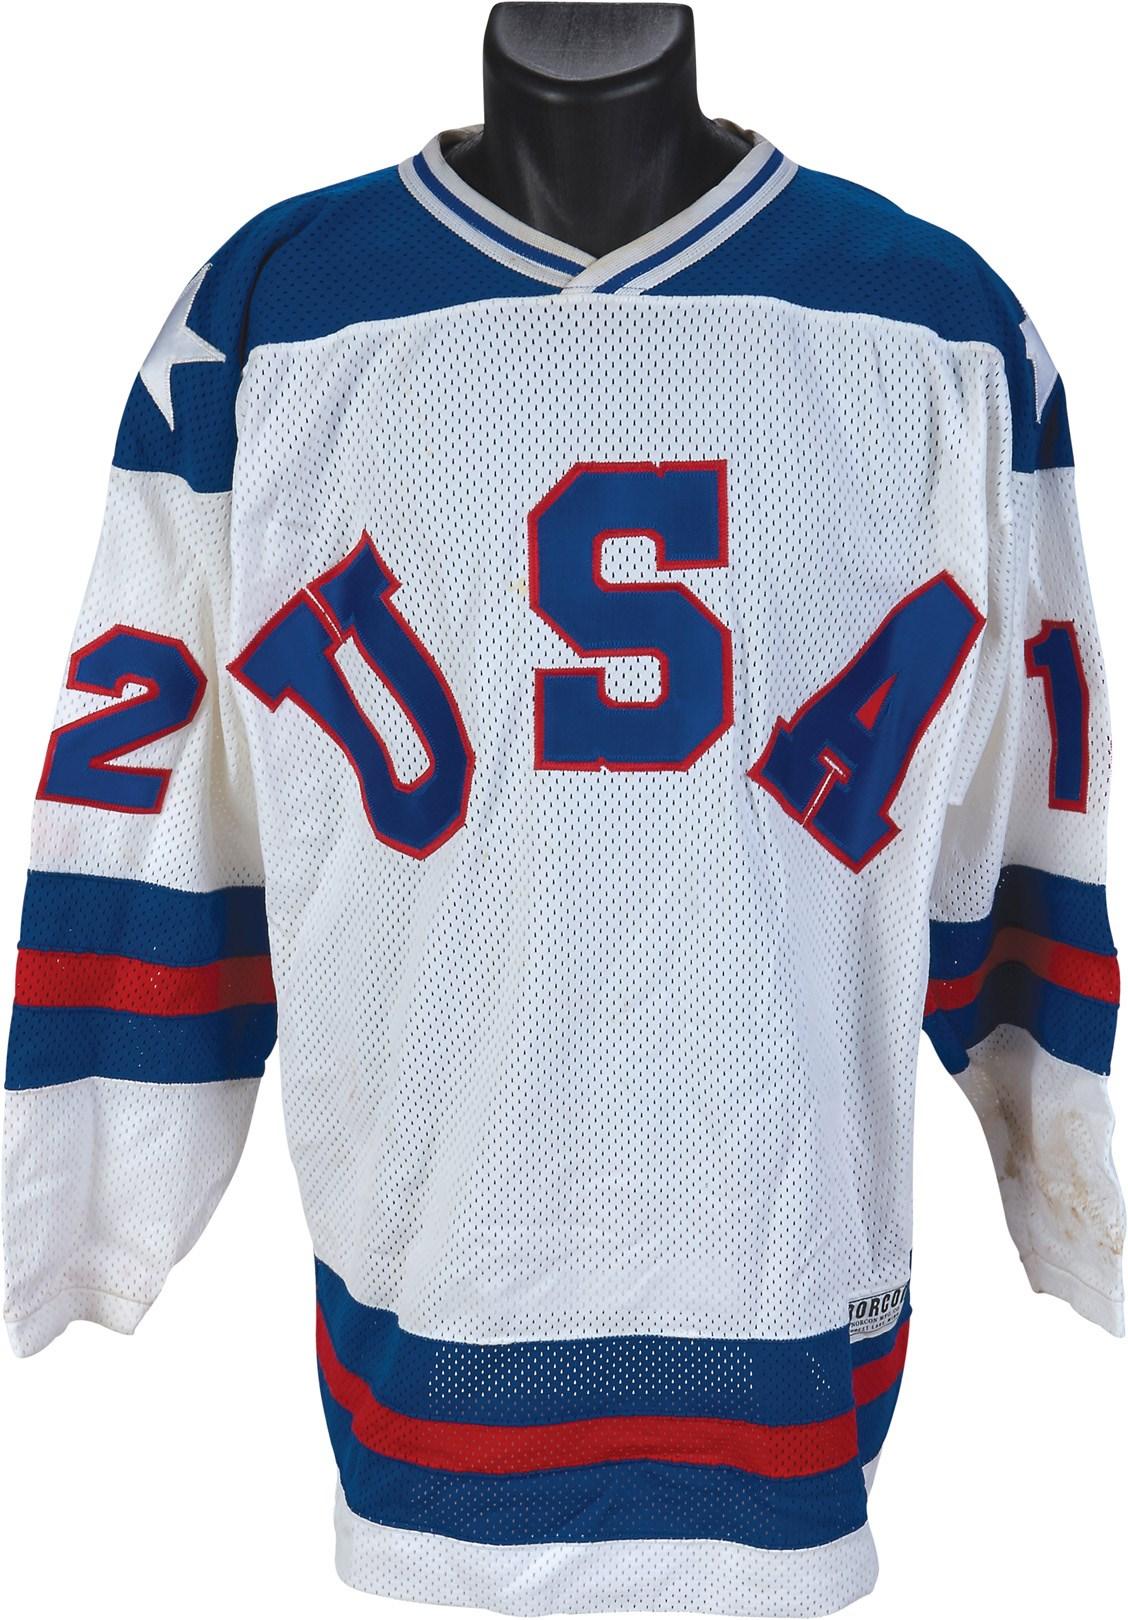 Jack Hughes Team Usa Pre Olympics Game Worn Jersey